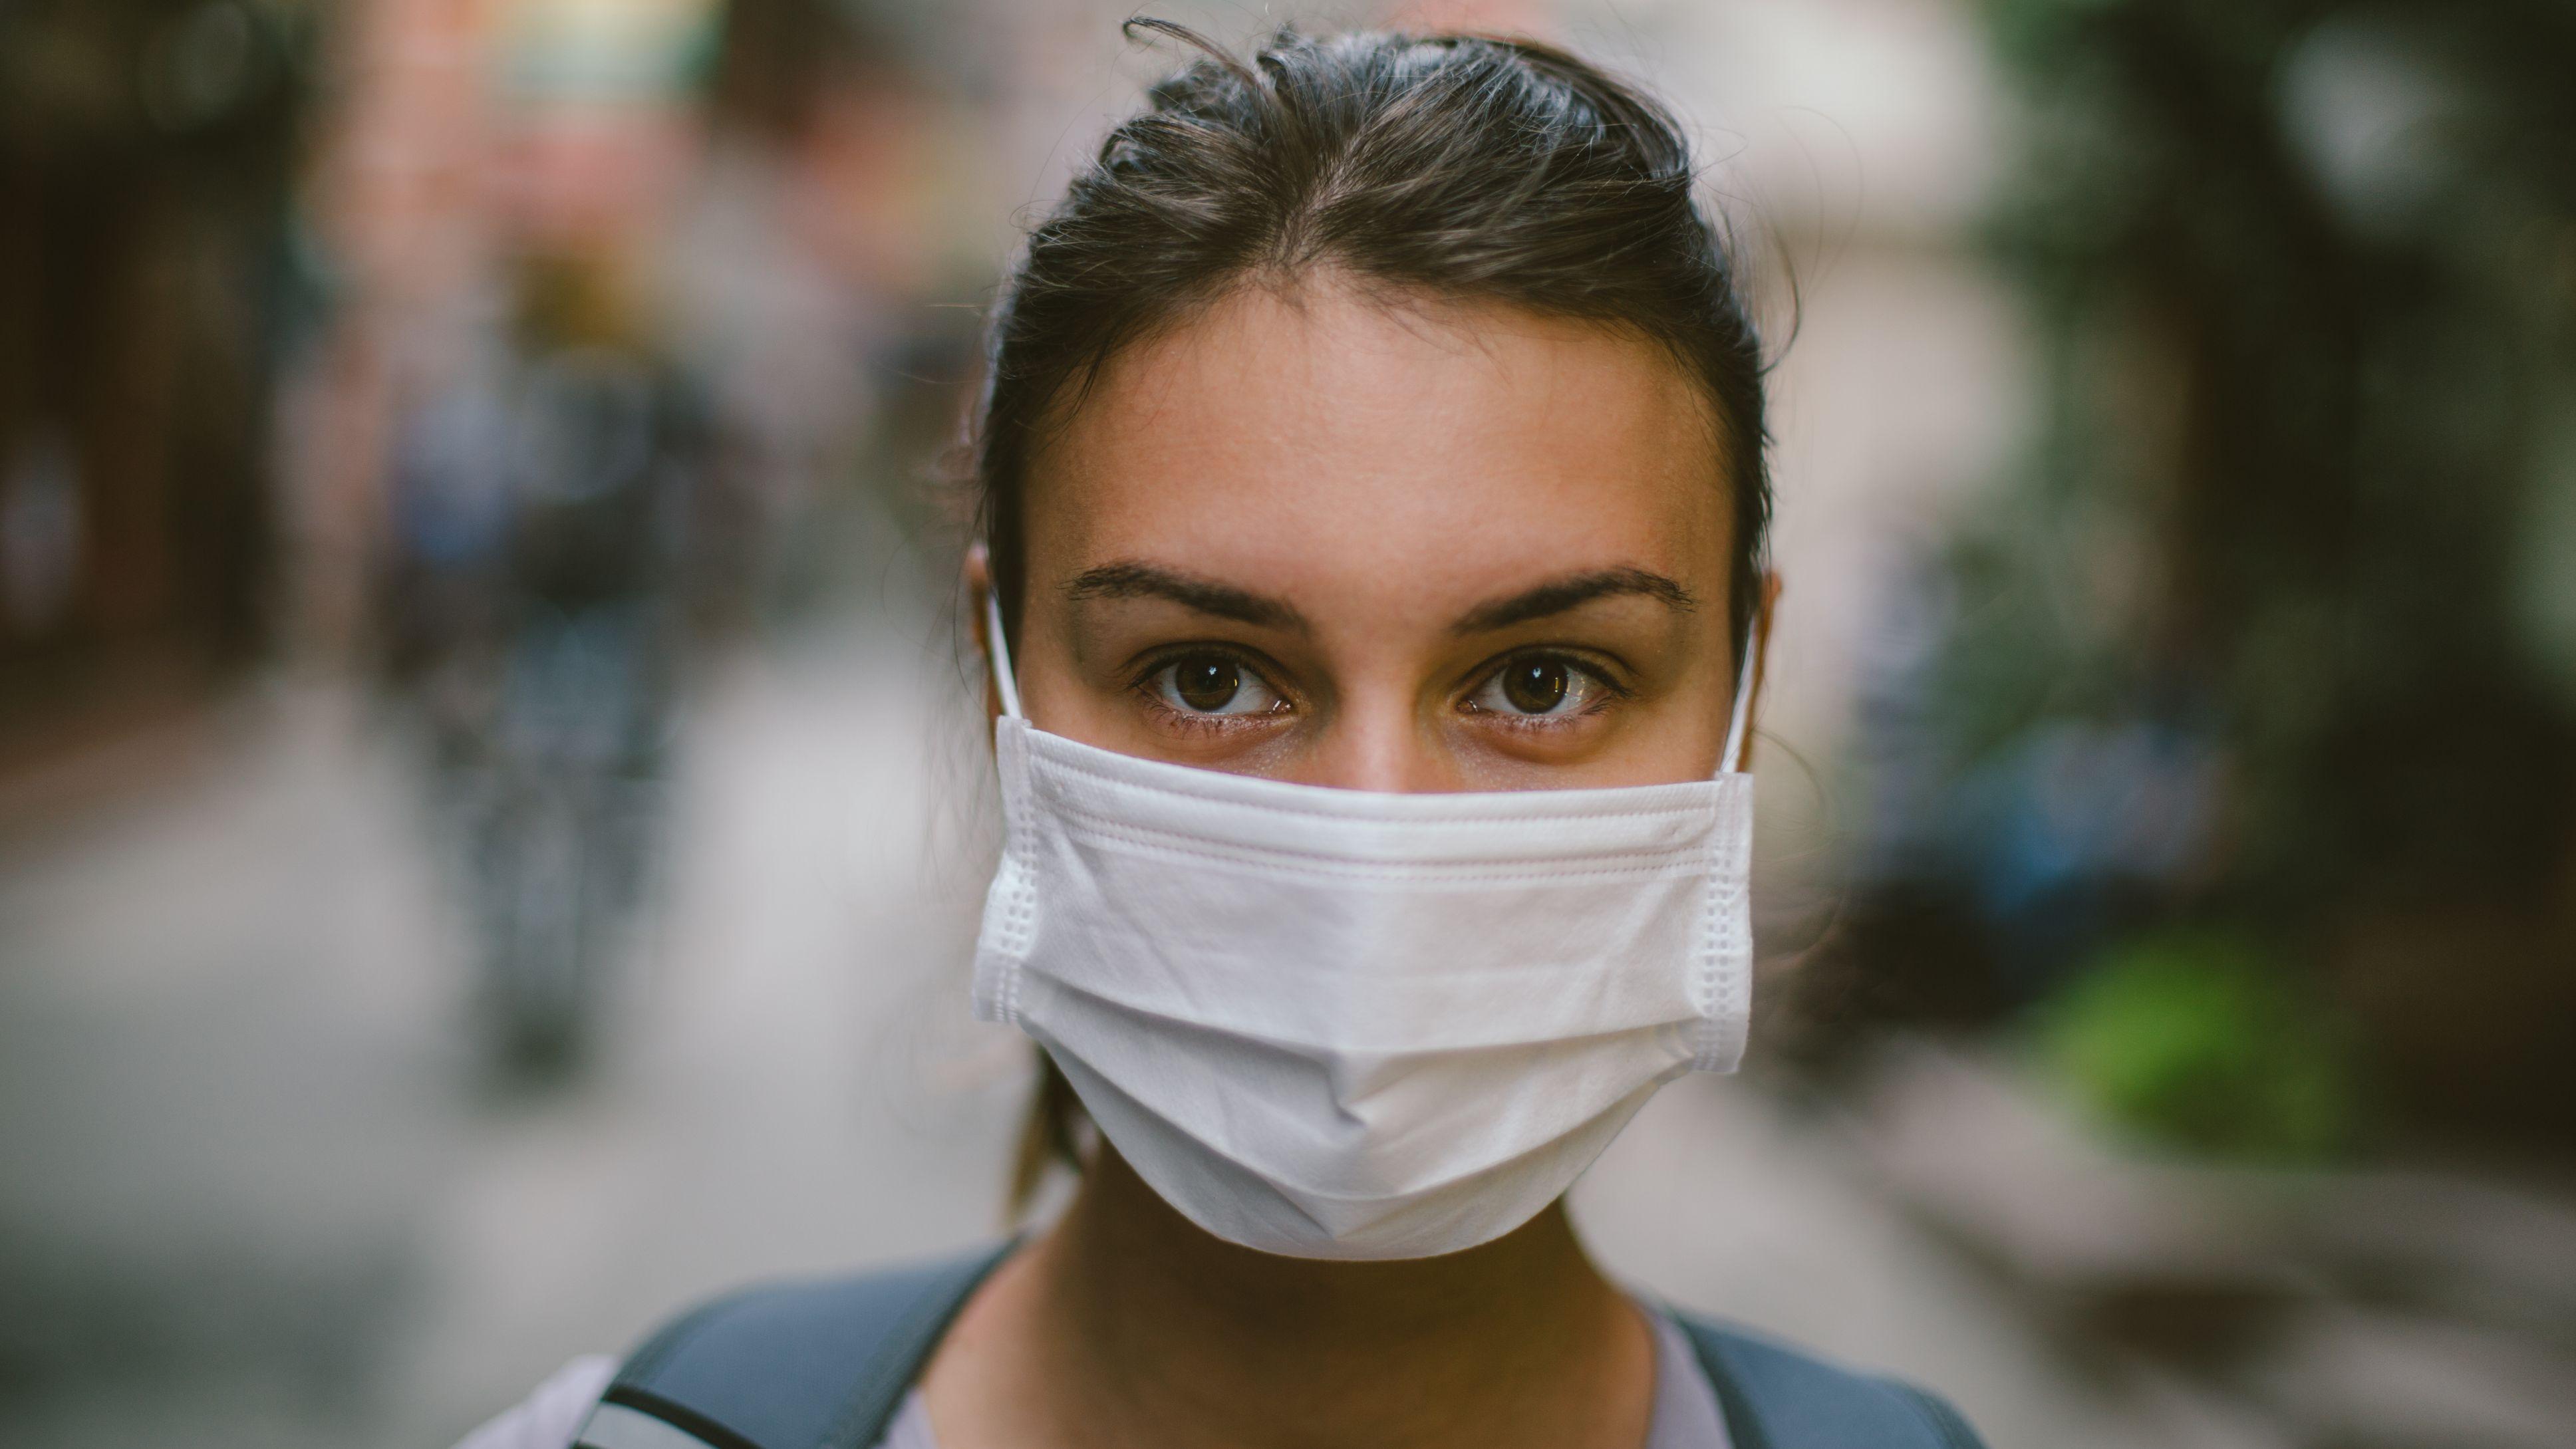 Лето вряд ли остановит распространение коронавируса